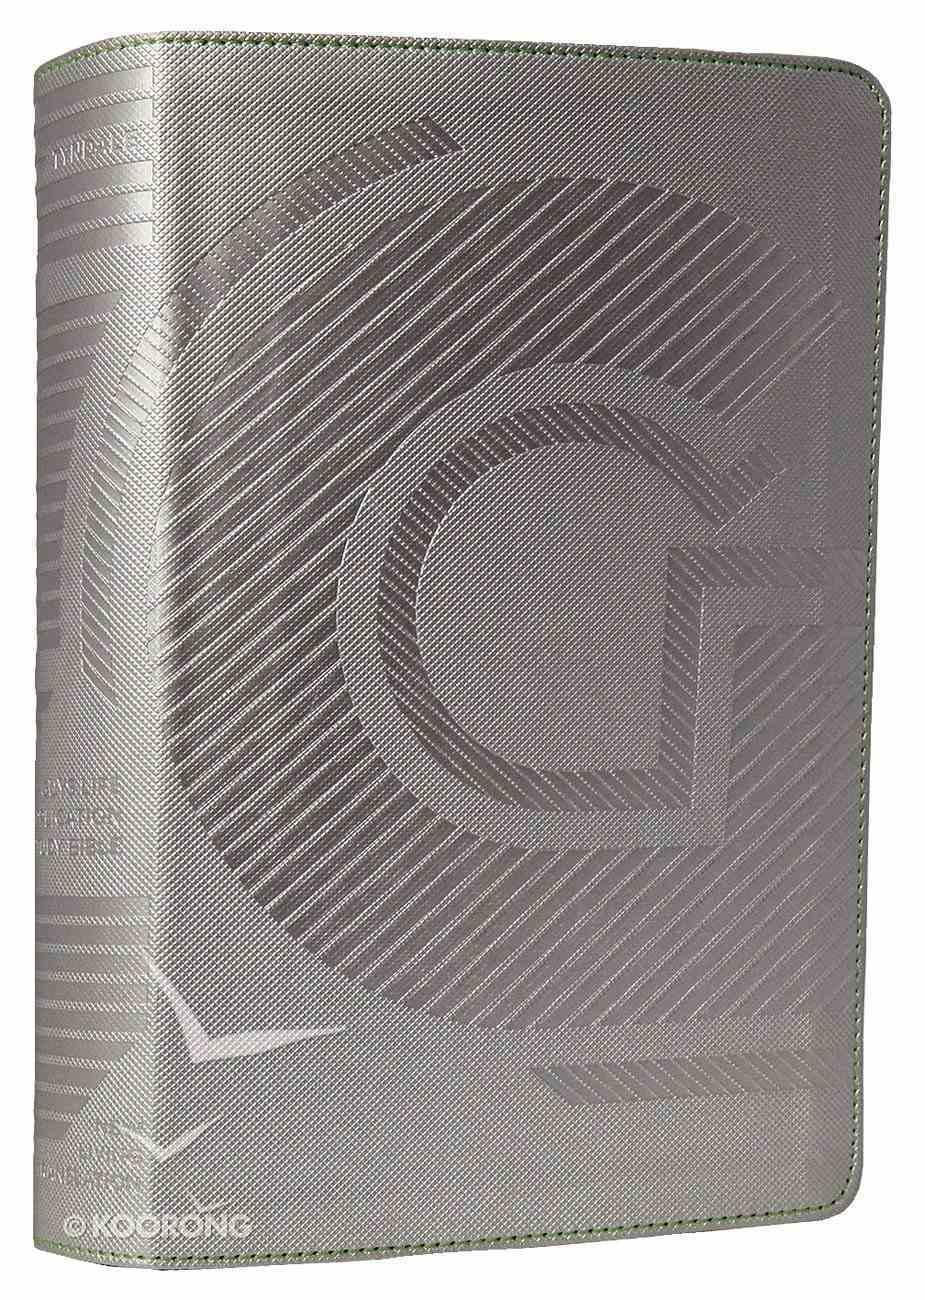 NLT Guys Life Application Study Bible Iridium (Black Letter Edition) Imitation Leather